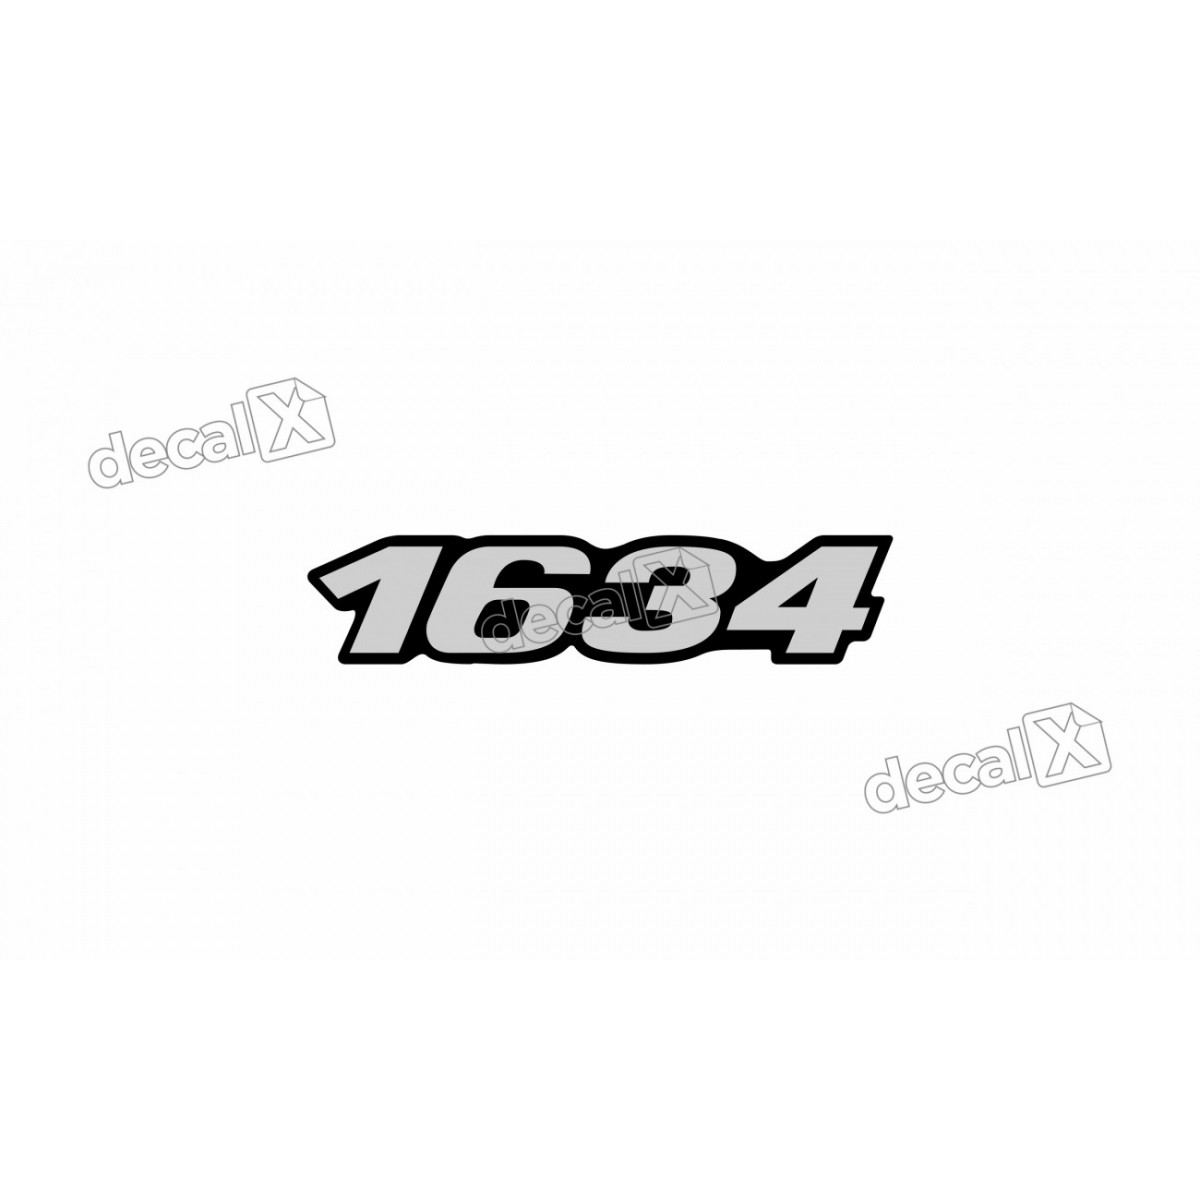 Adesivo Emblema Resinado Mercedes 1634 Cm56 Decalx